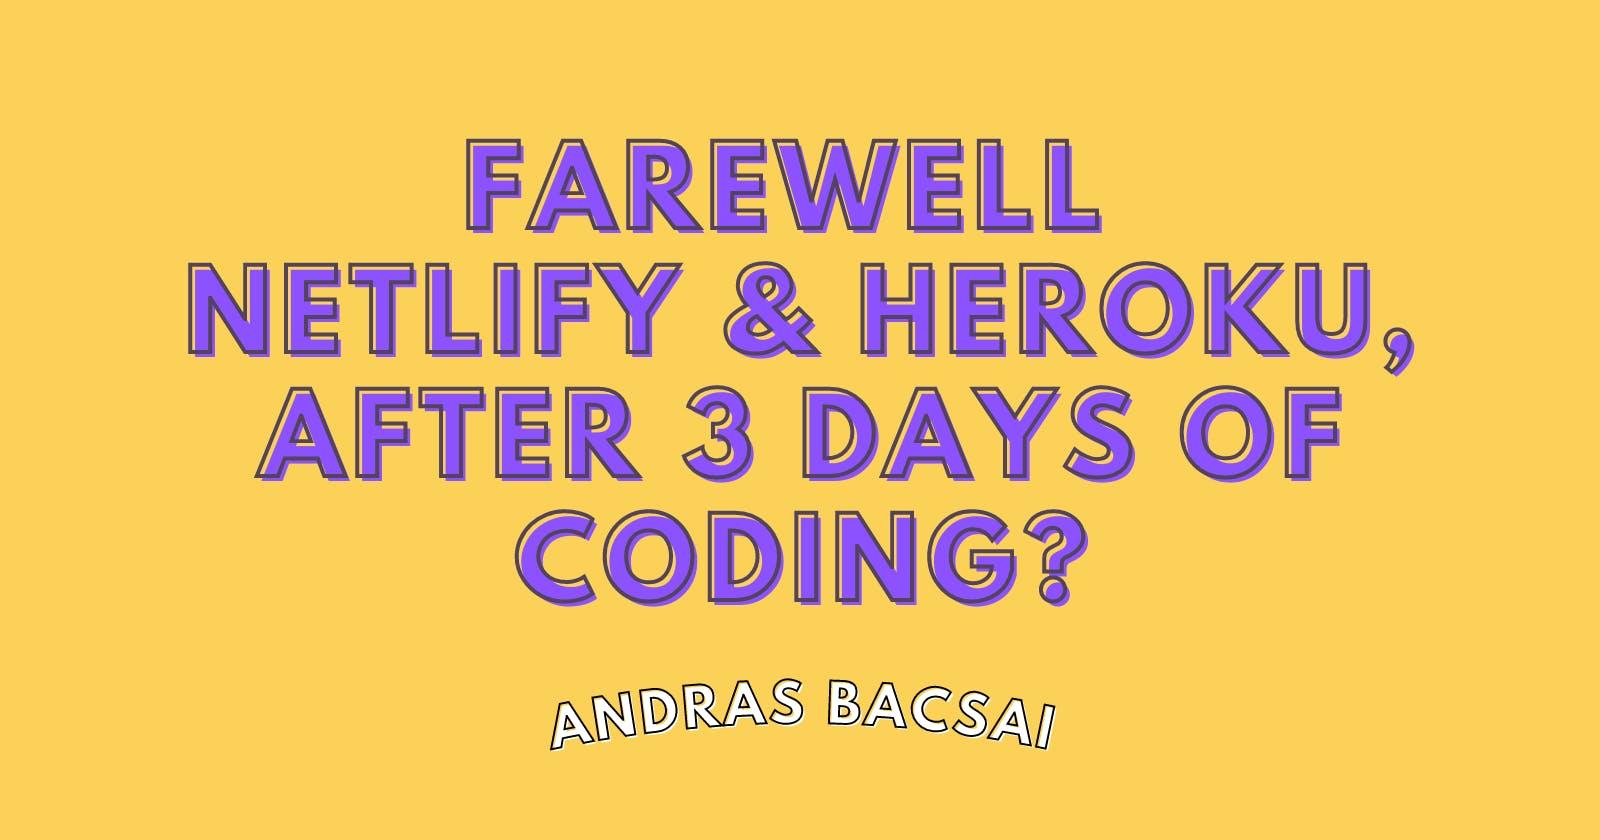 Farewell Netlify & Heroku, after 3 days of coding? 🤯